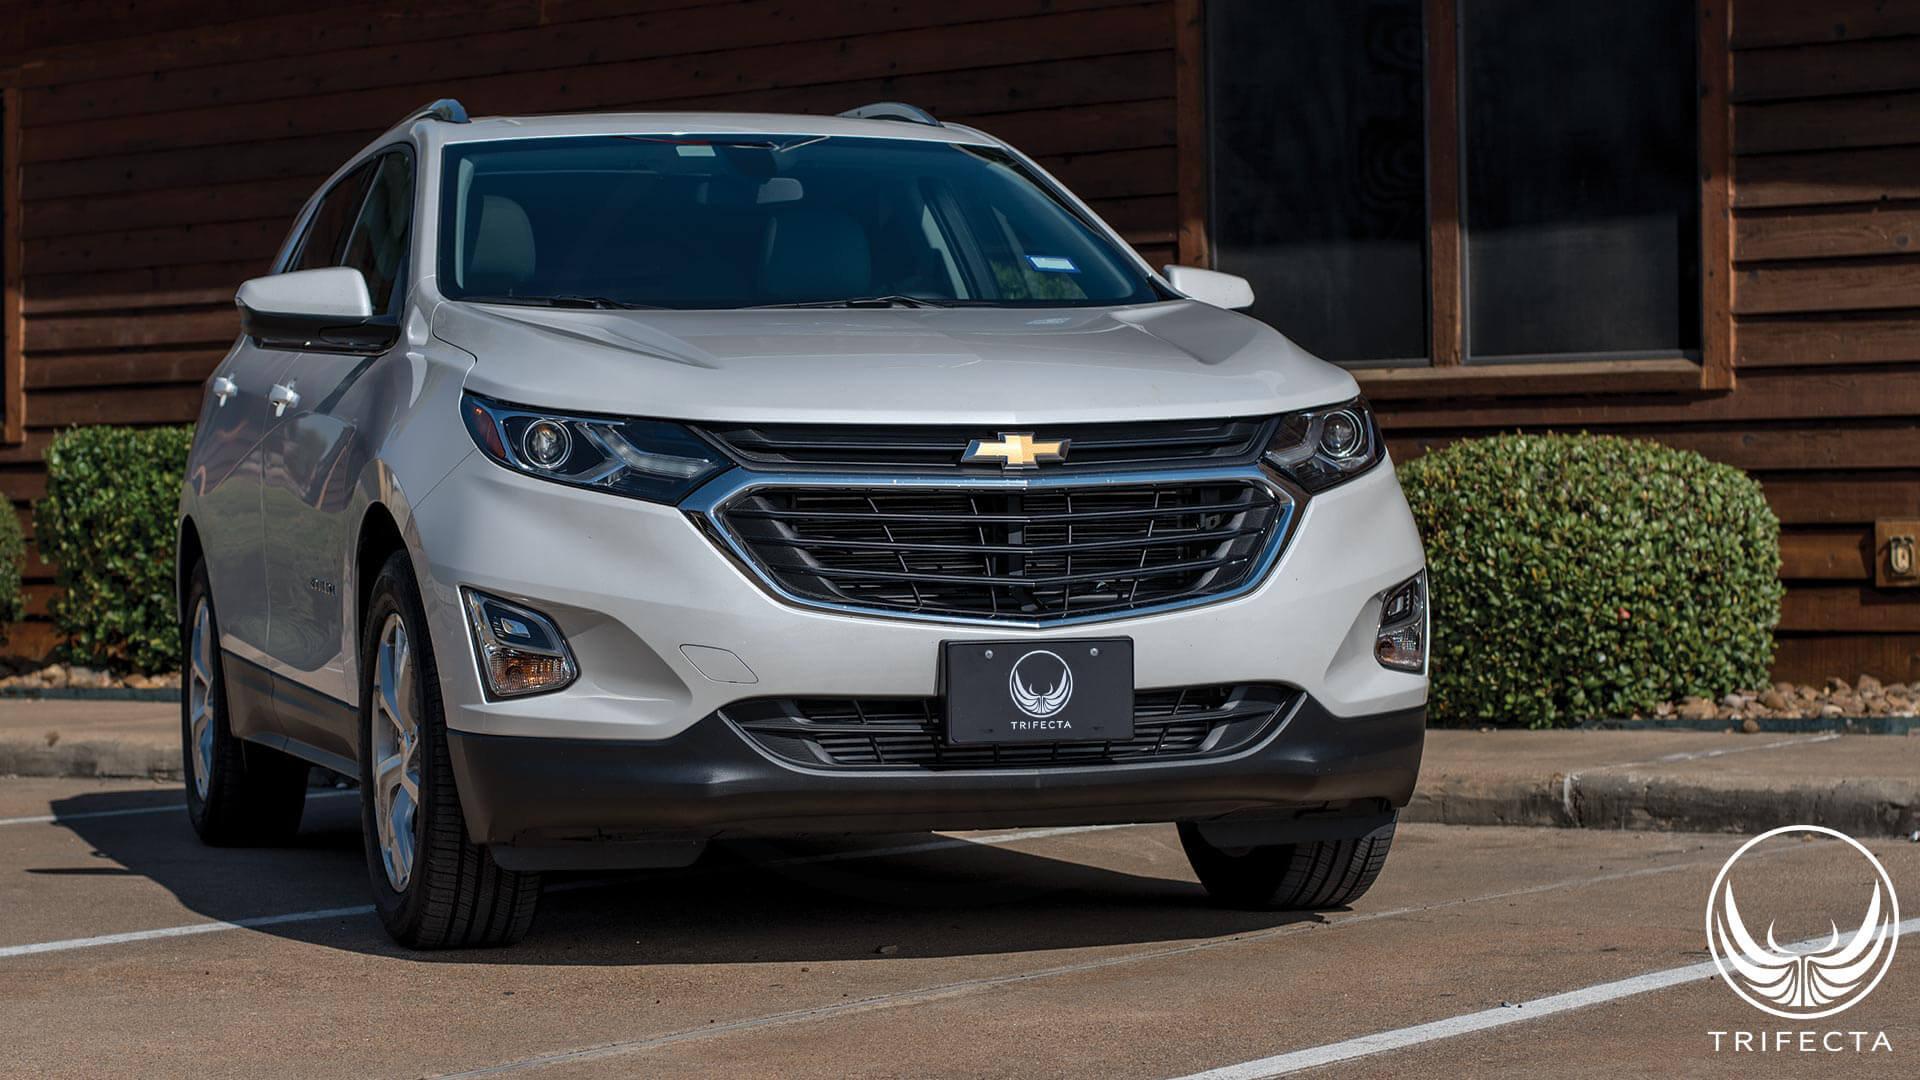 Product Review: 2018--2020 Chevrolet Equinox - 2.0L Turbo - Advantage